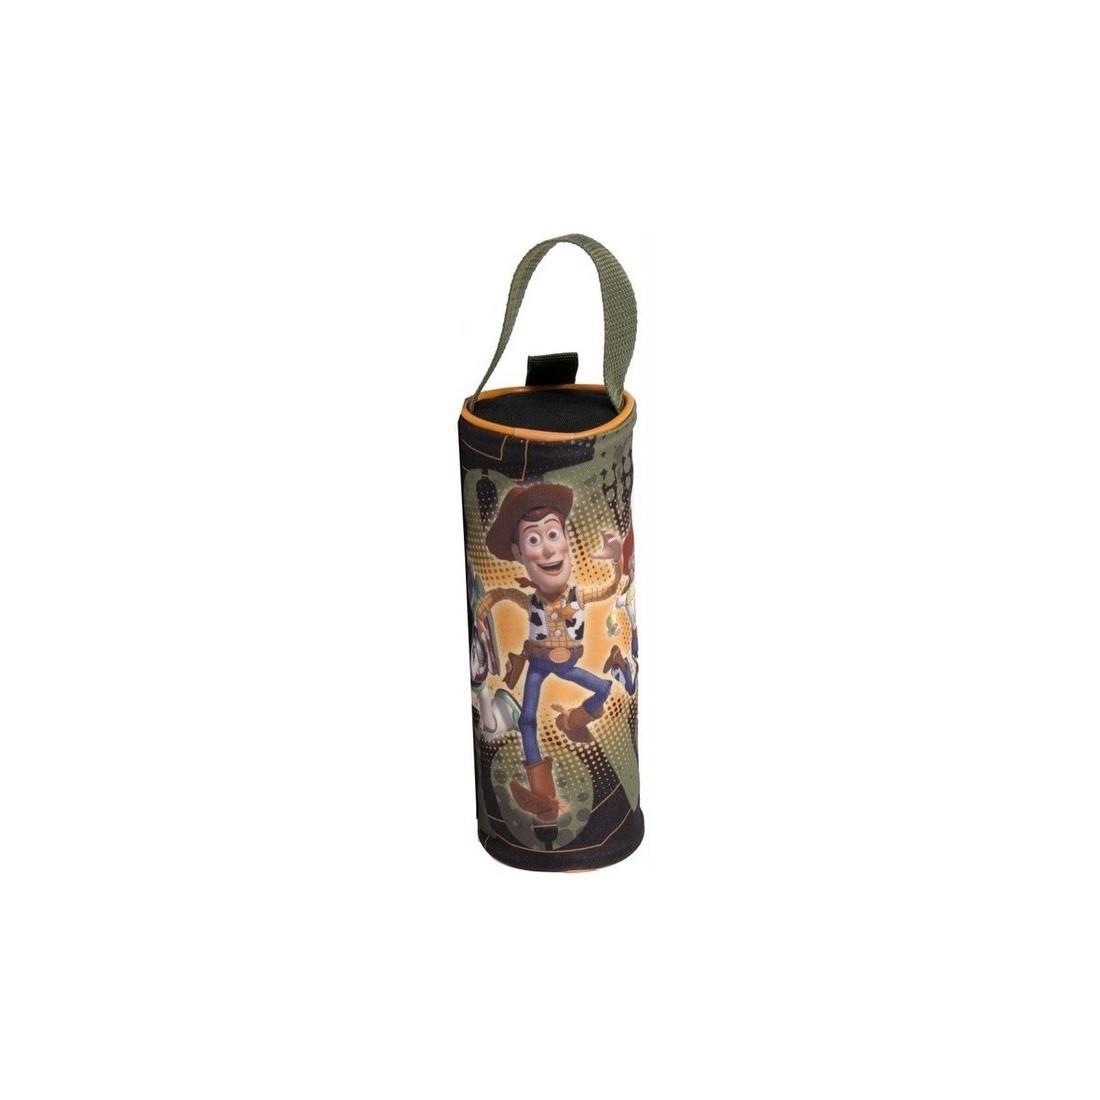 Piórnik szkolny tuba Toy Story - plecak-tornister.pl